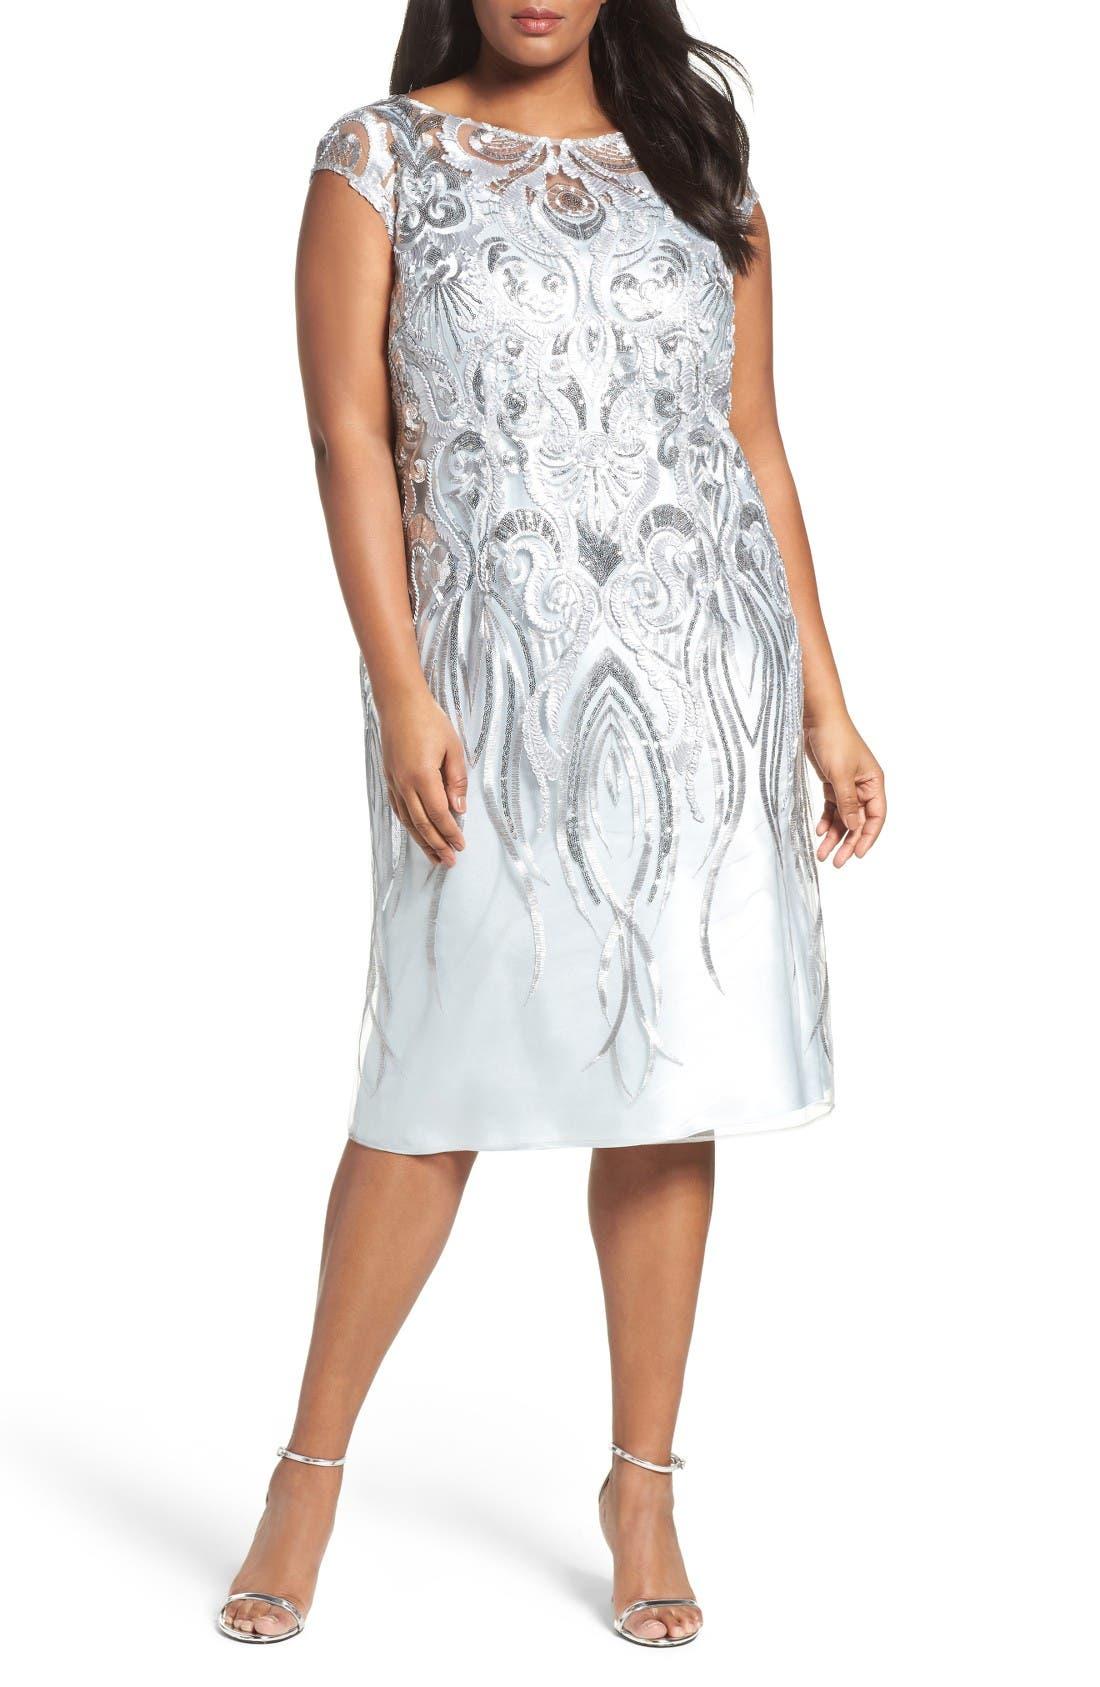 Main Image - Brianna Embellished Bateau Neck Cocktail Dress (Plus Size)